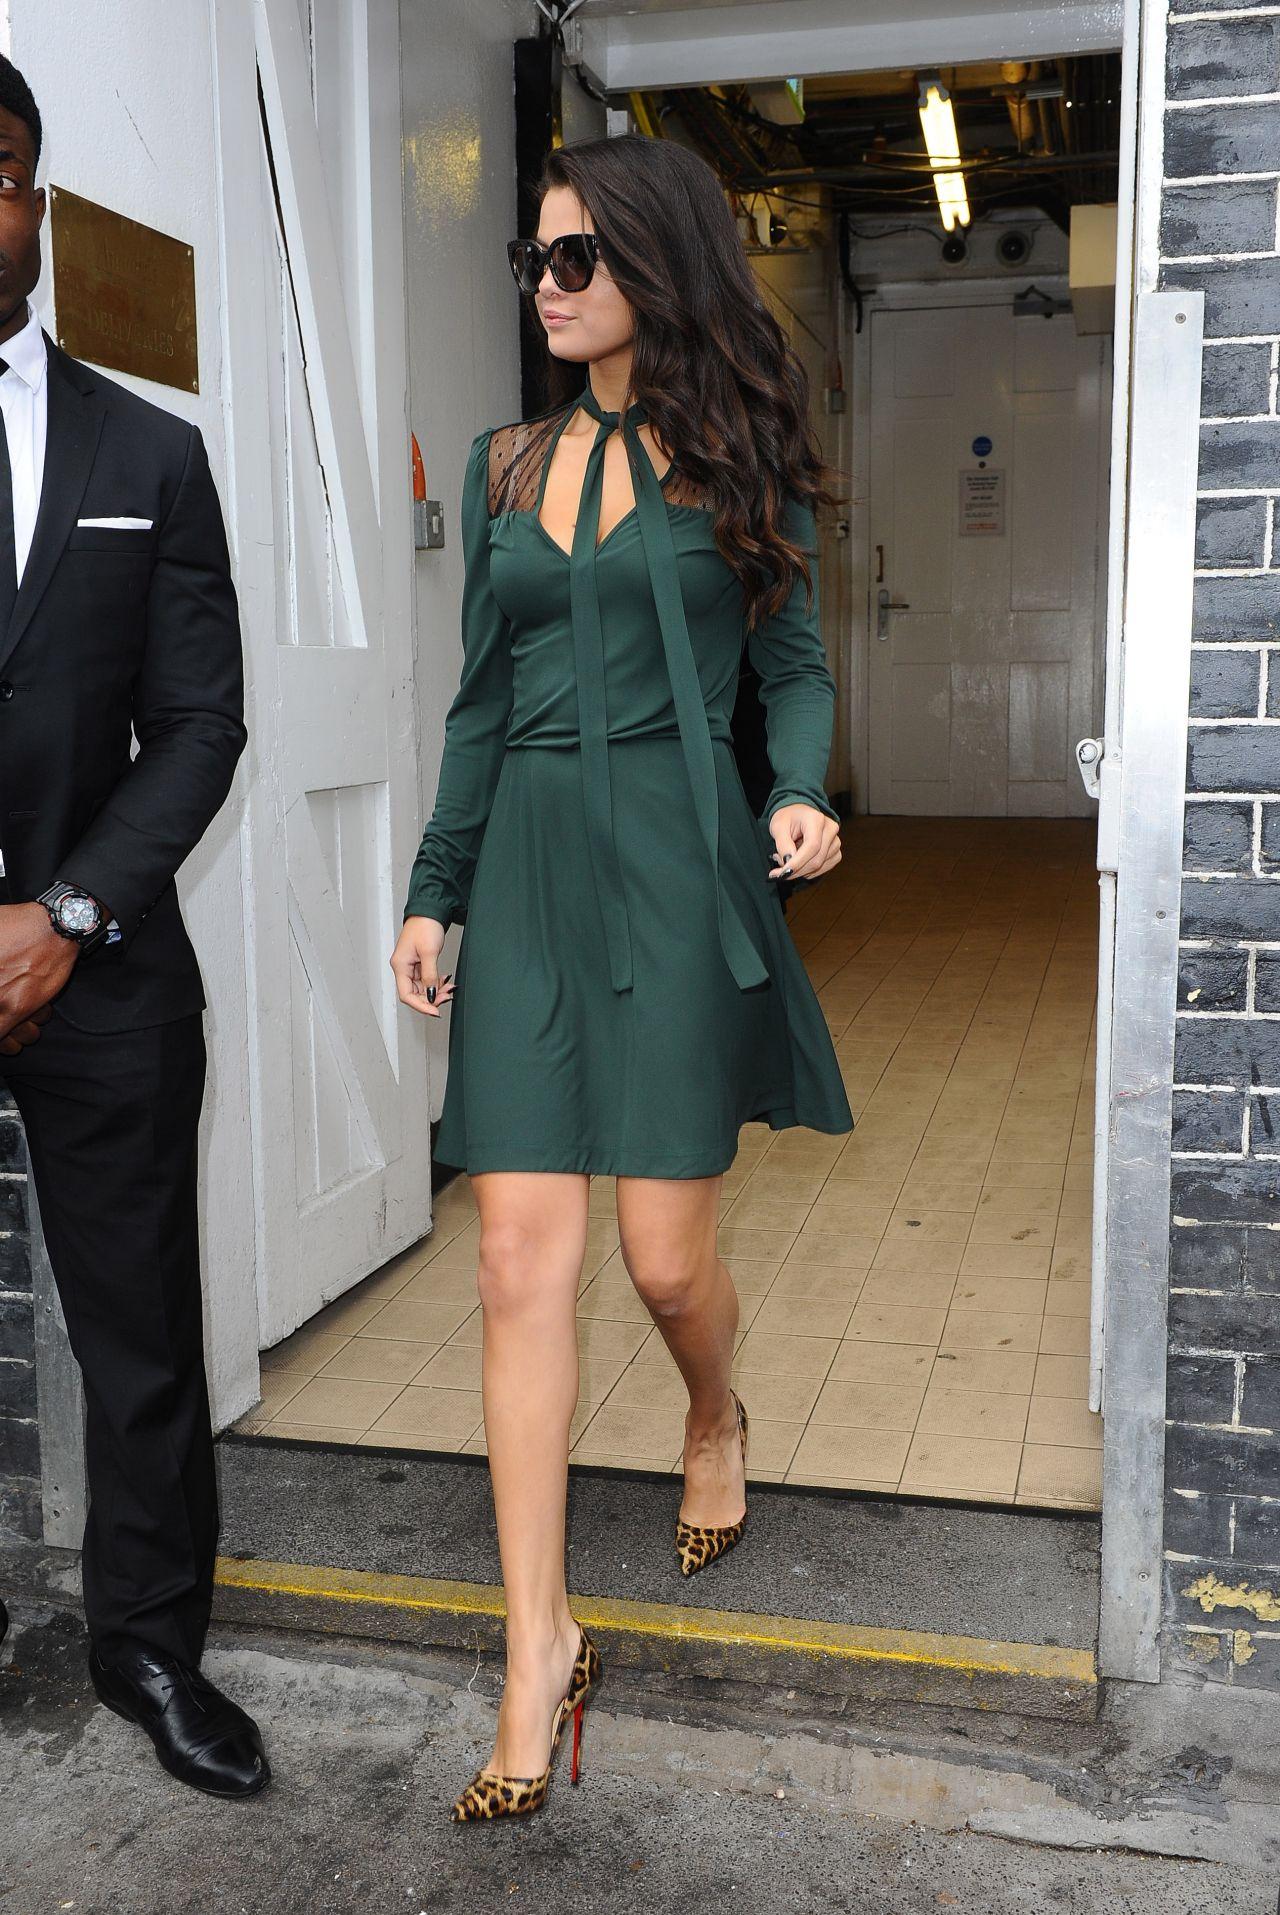 Selena Gomez in Green Dress - Out in London, September 2015